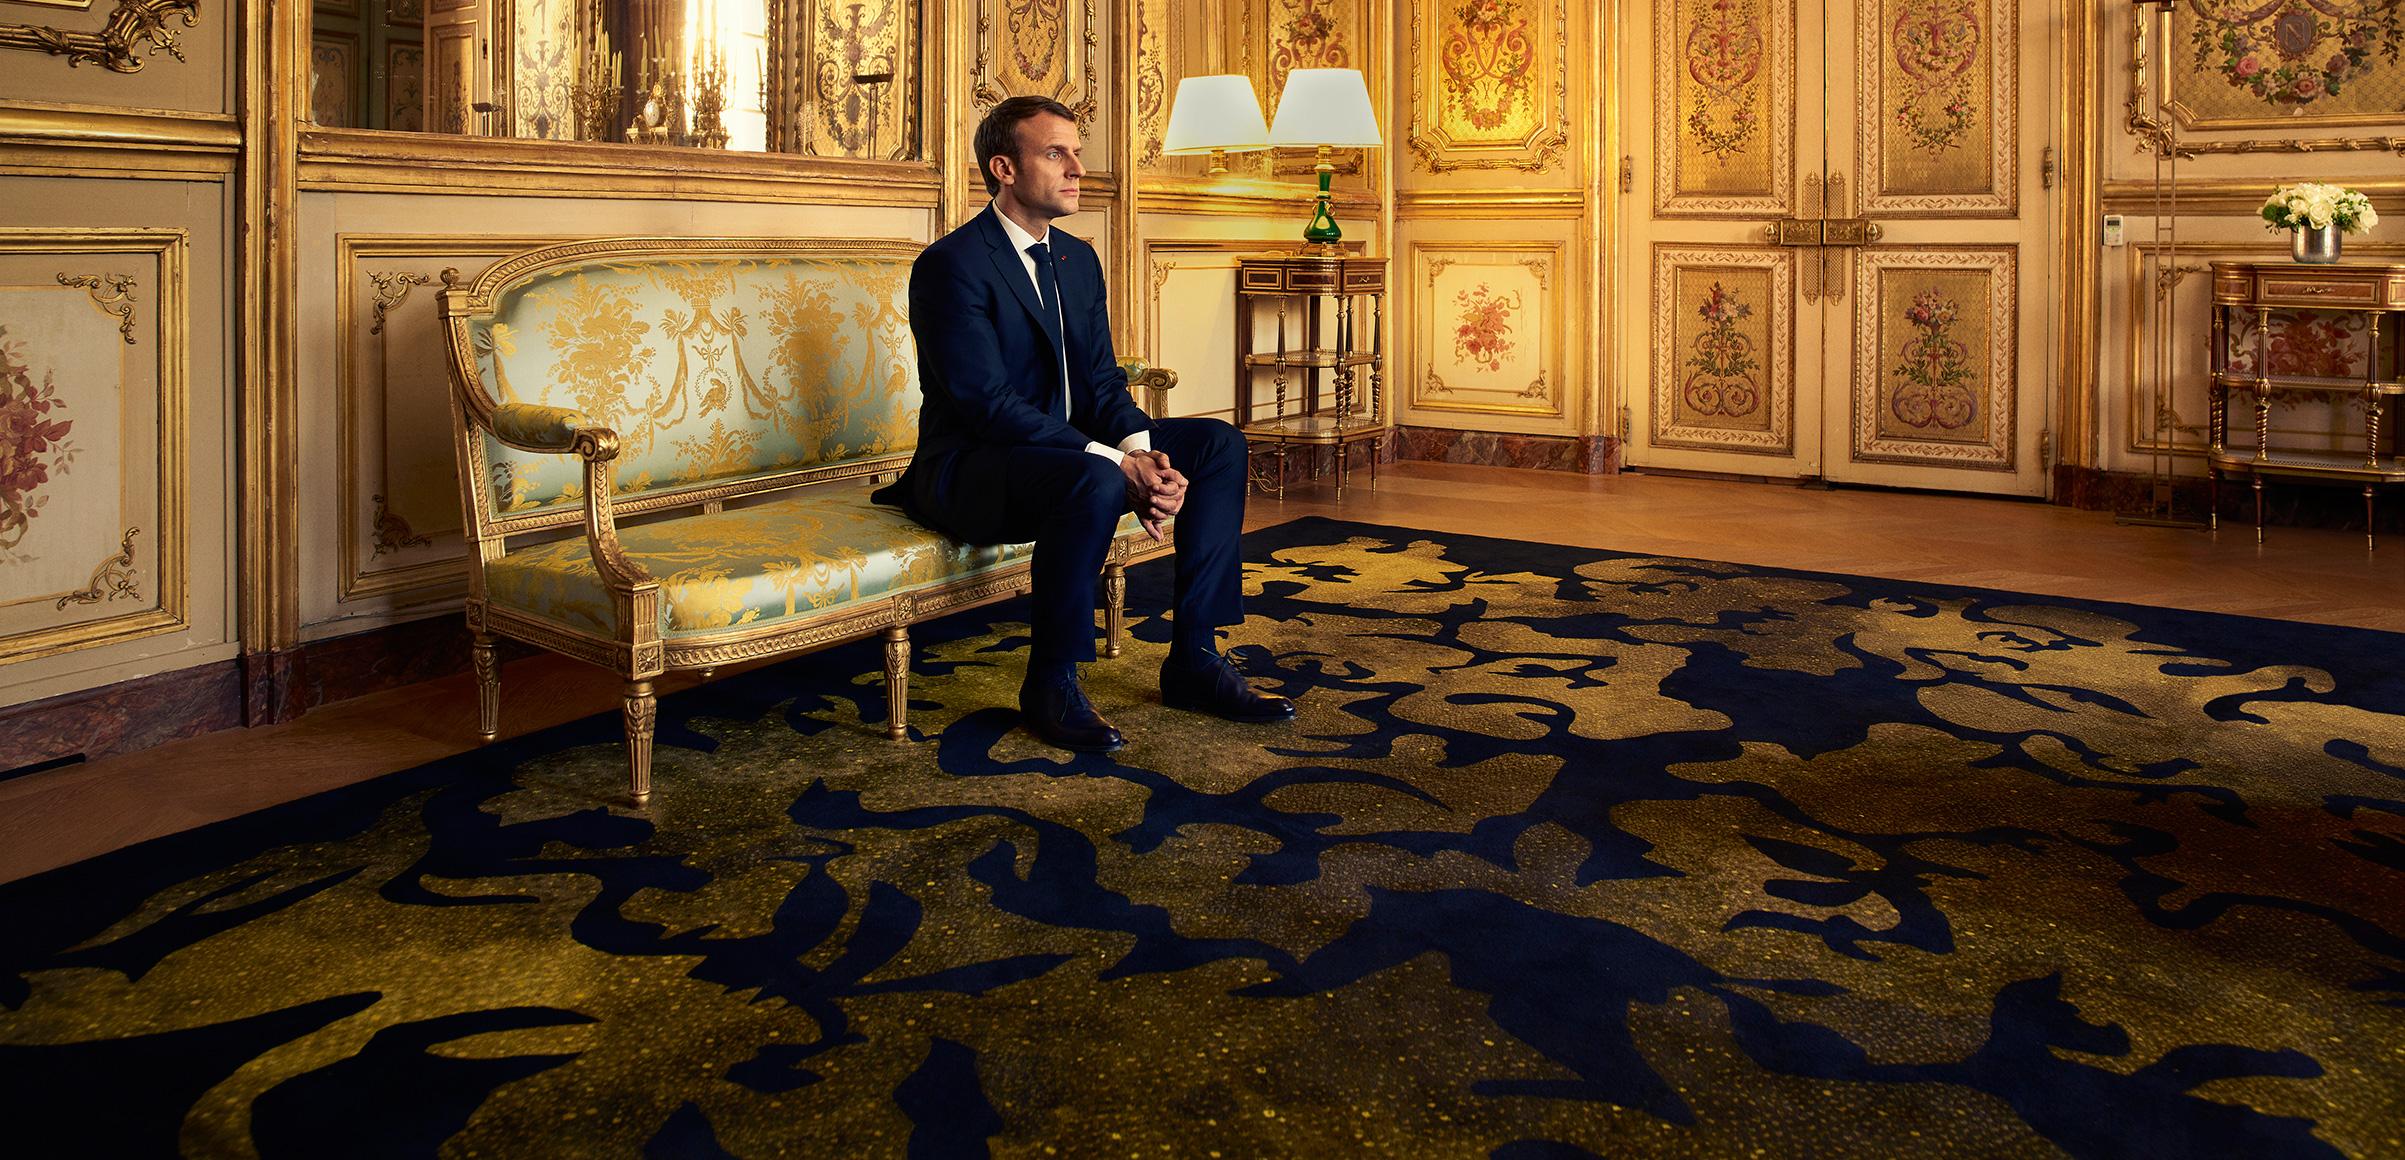 Savonnerie Carpet at the Salon Dore